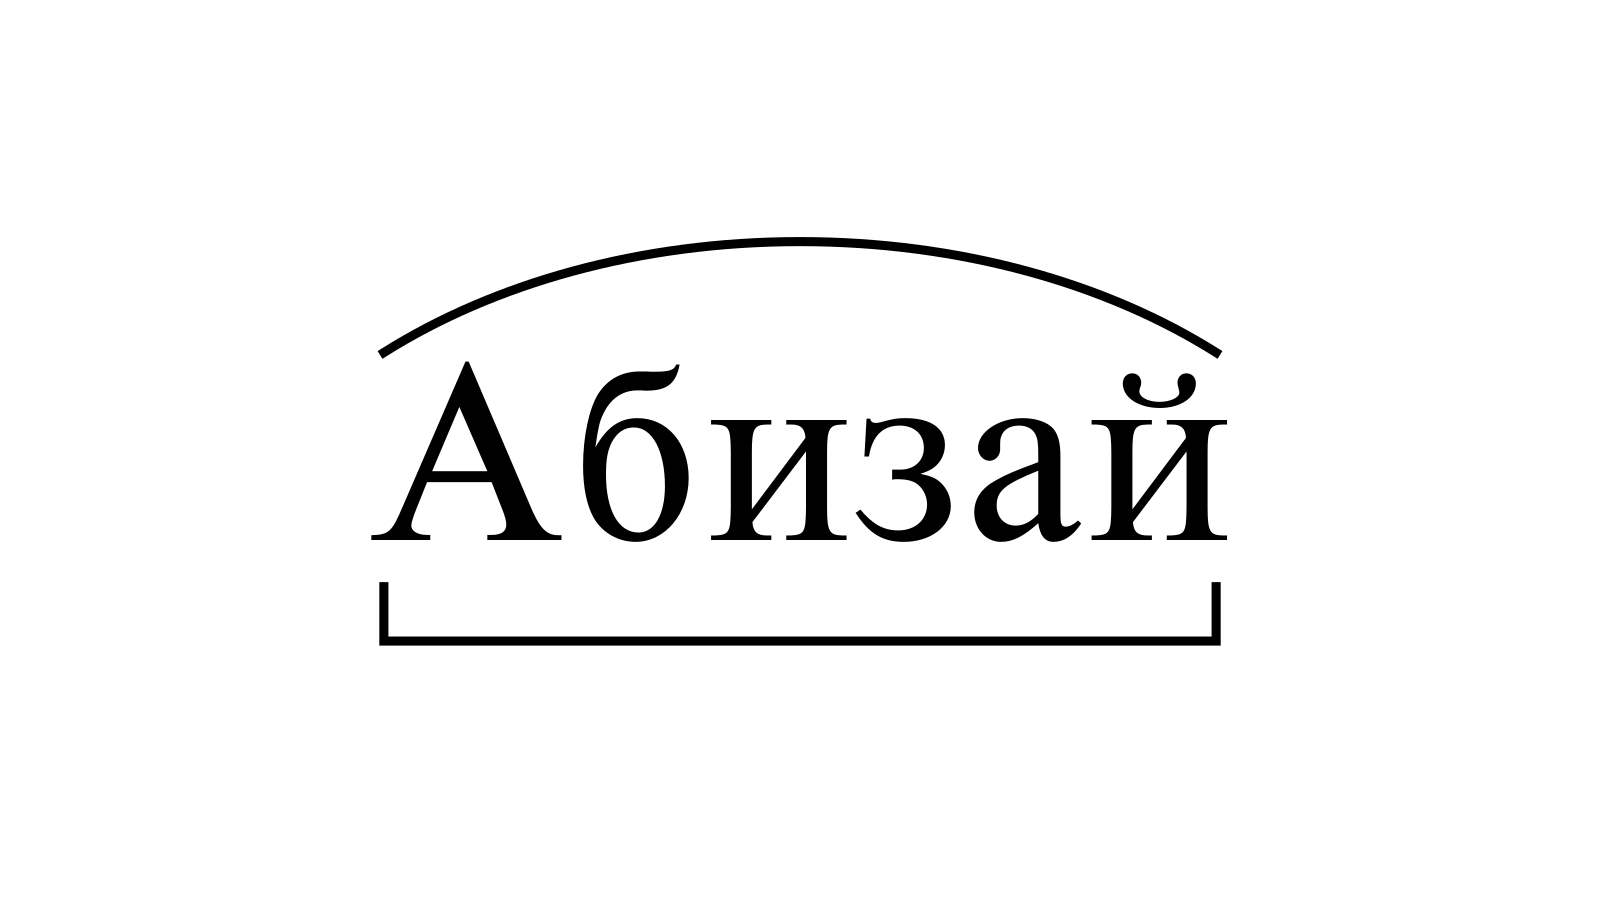 Разбор слова «Абизай» по составу